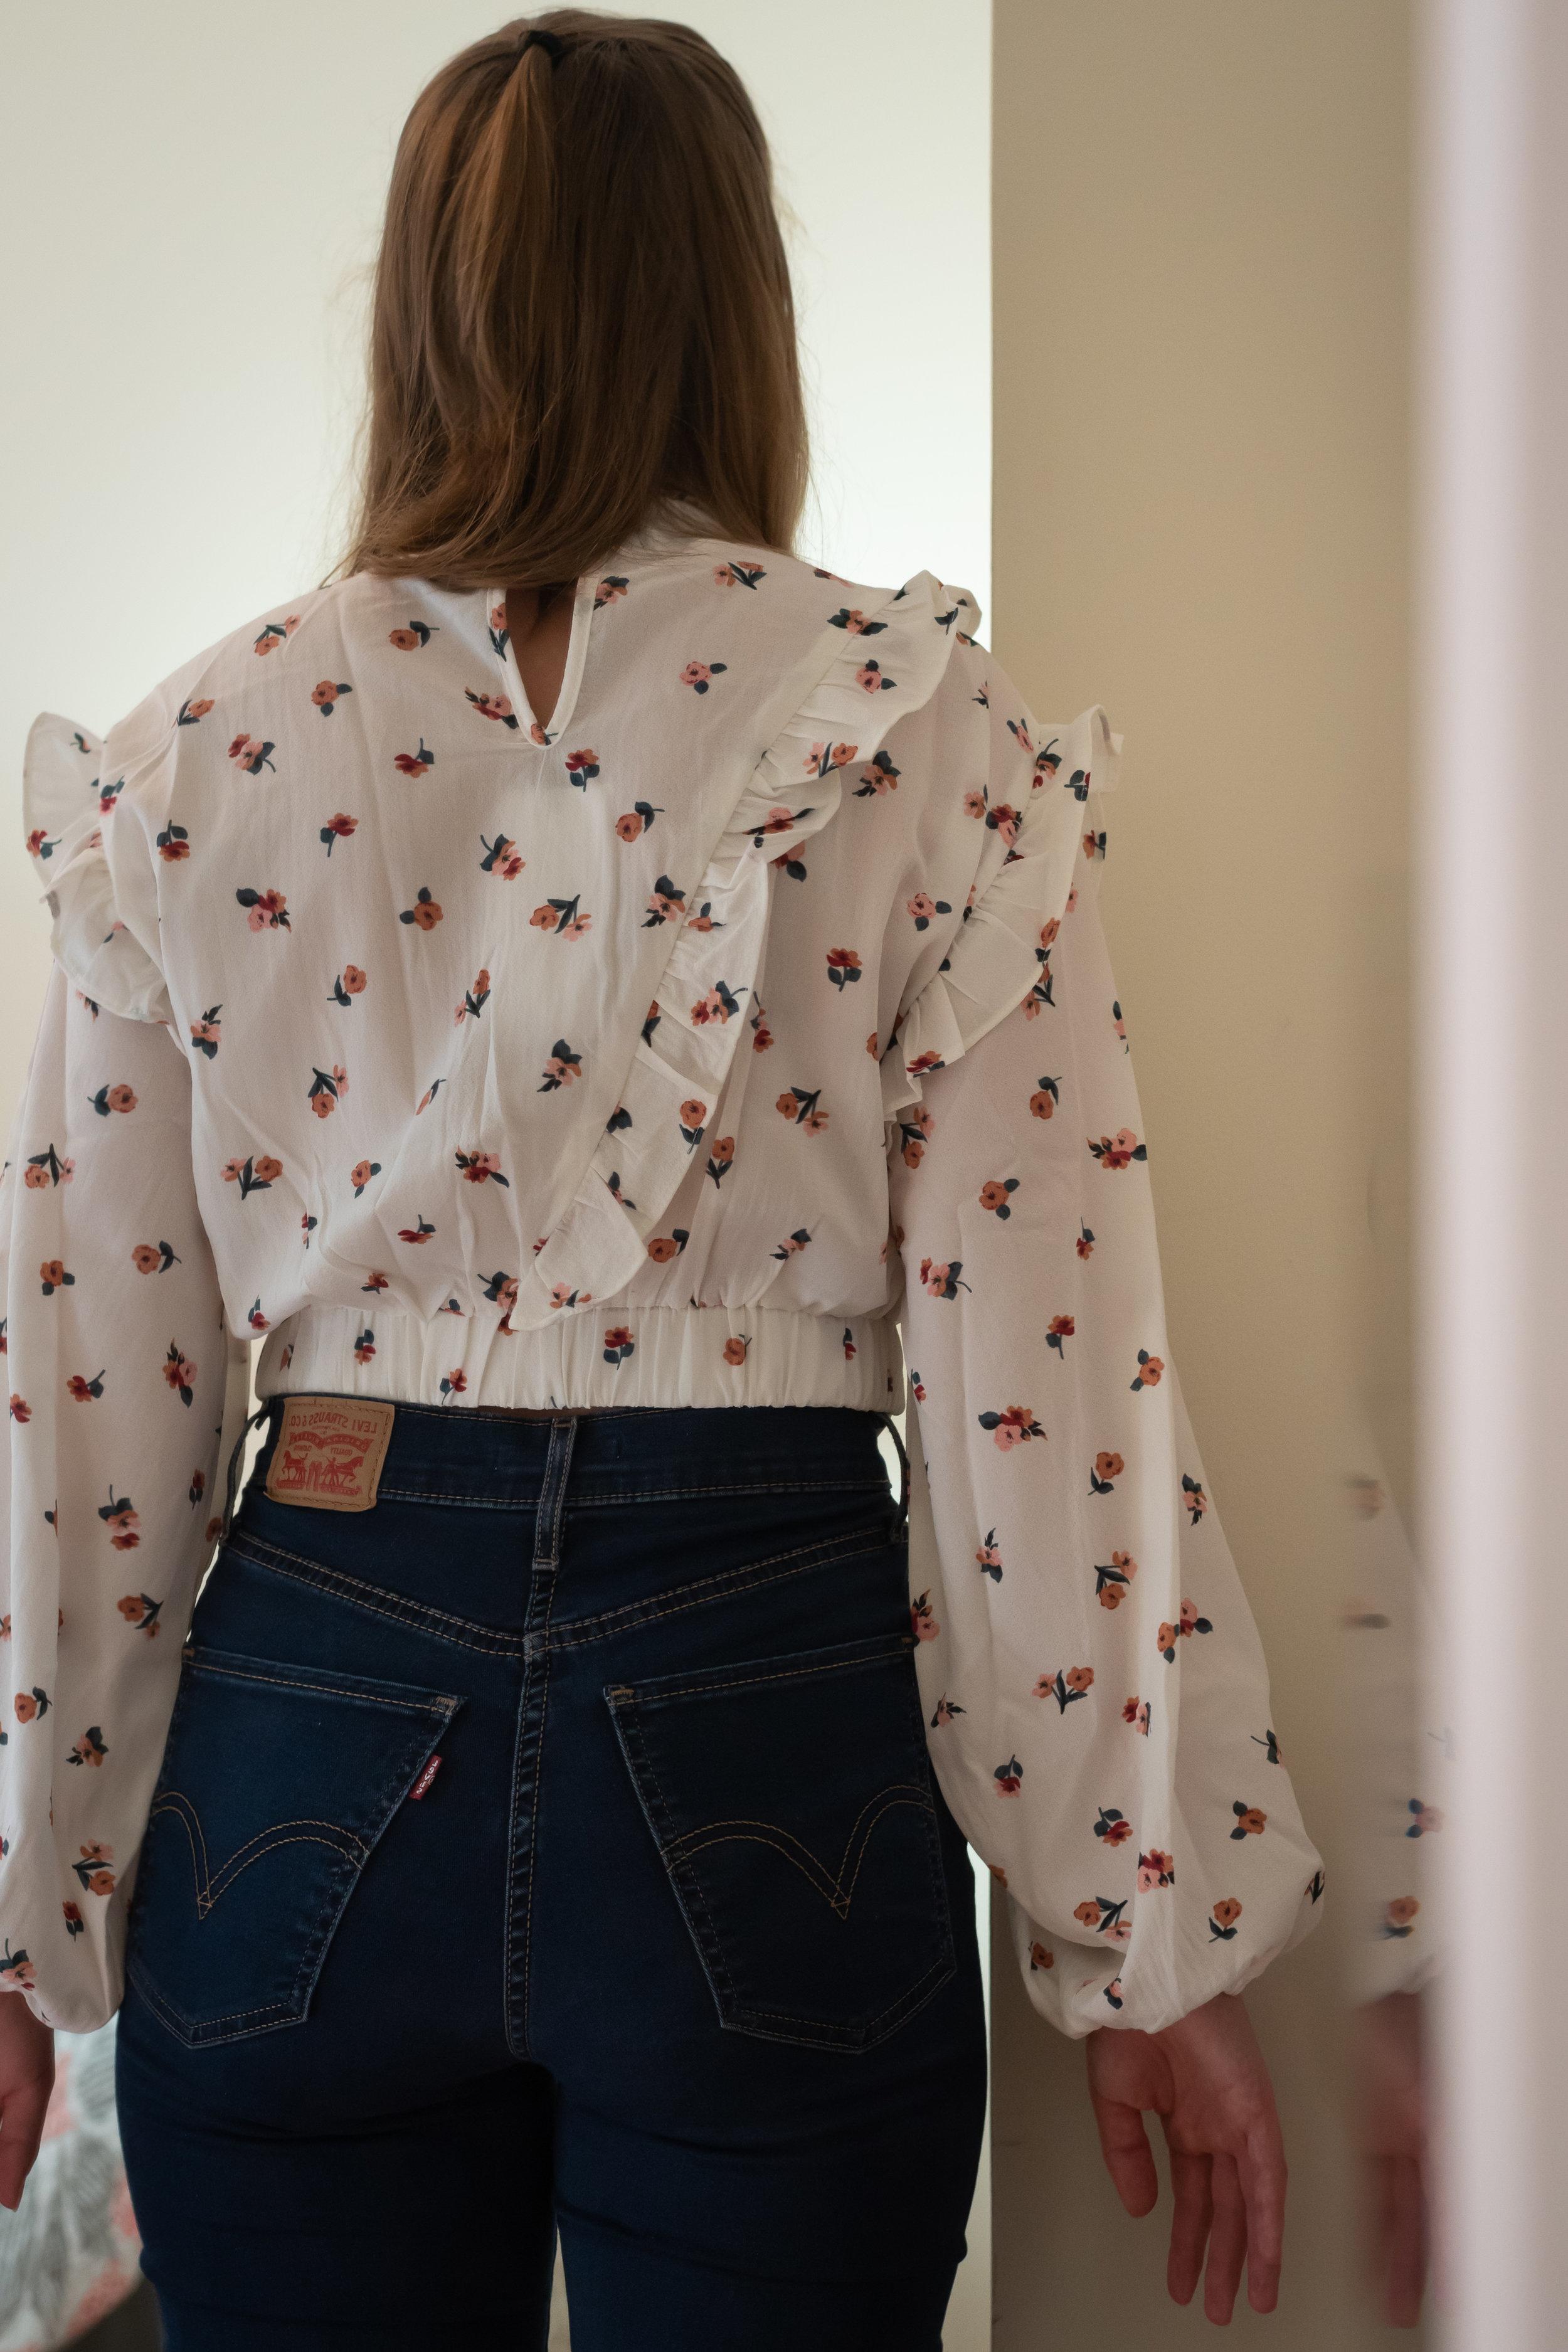 Fashion Union Petite High Neck Long Sleeve Blouse - Size 6 Petite - BACK